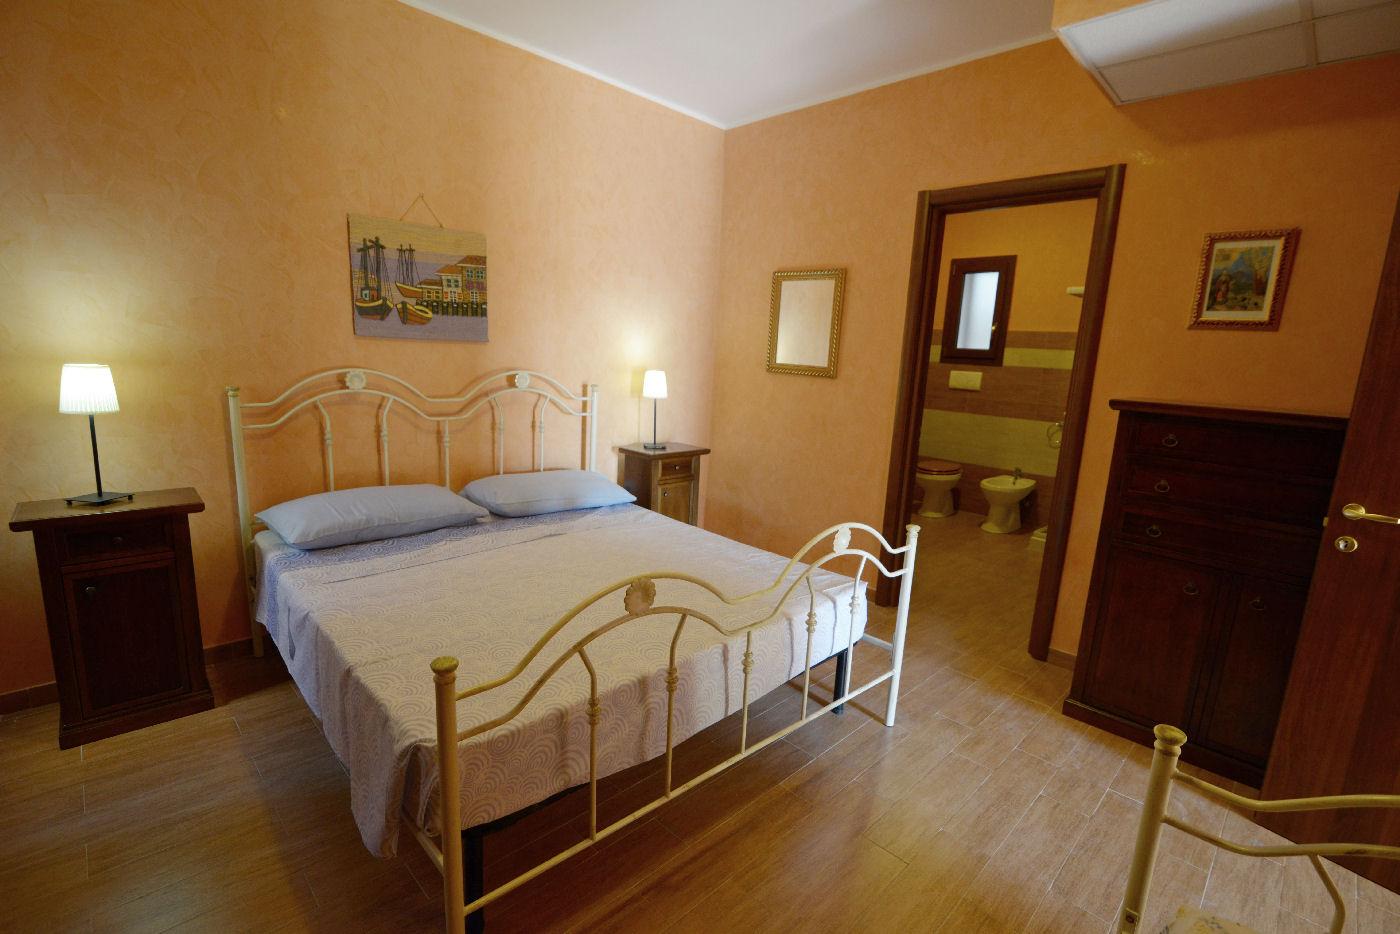 particolari camera matrimoniale Toto residence Torre Lapillo